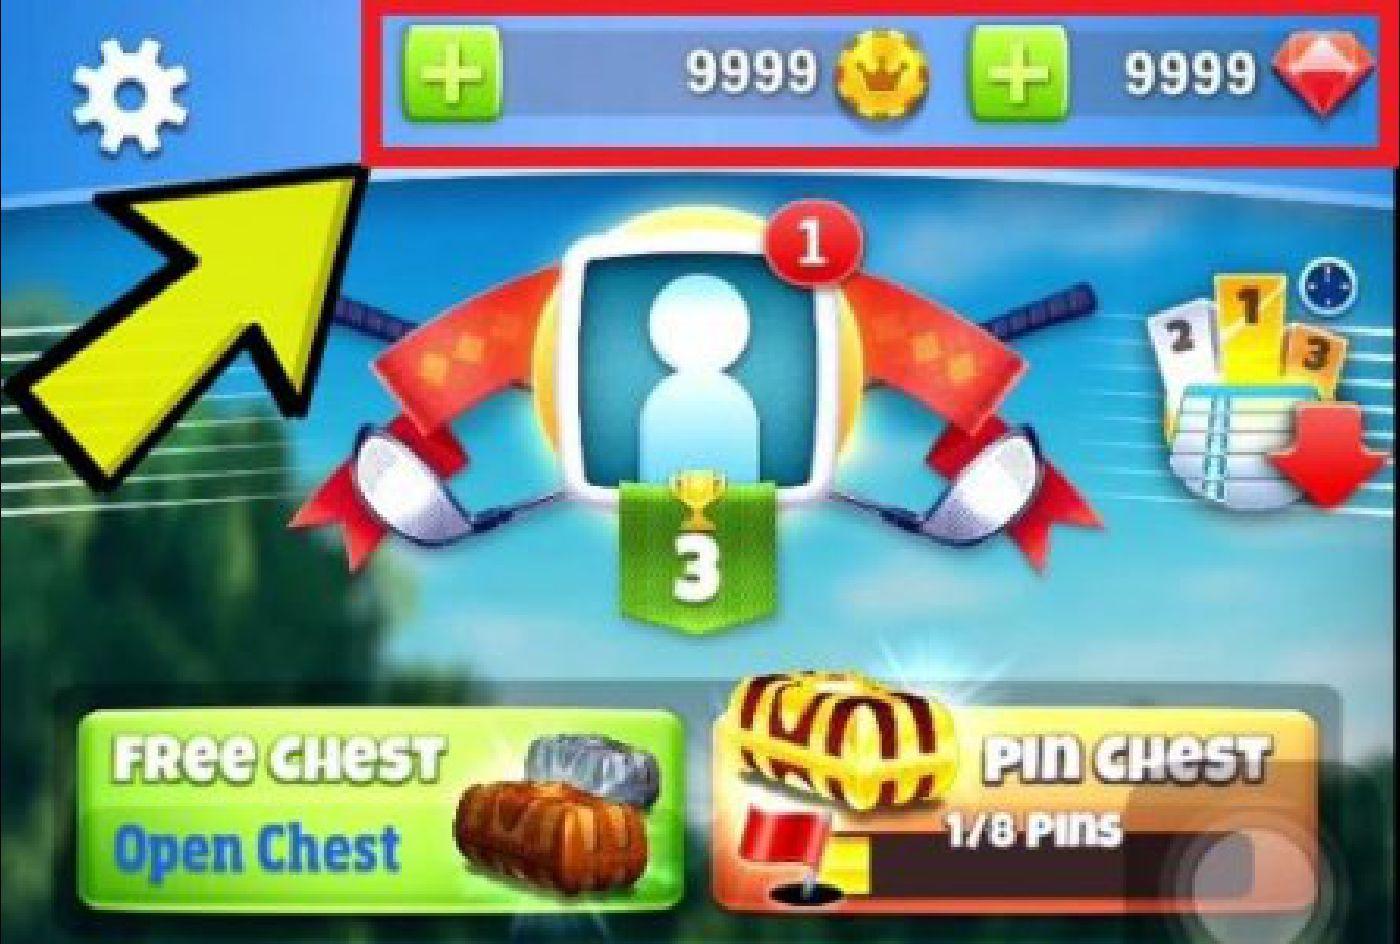 Golf clash cheats, golf clash hack, golf clash tips, golf